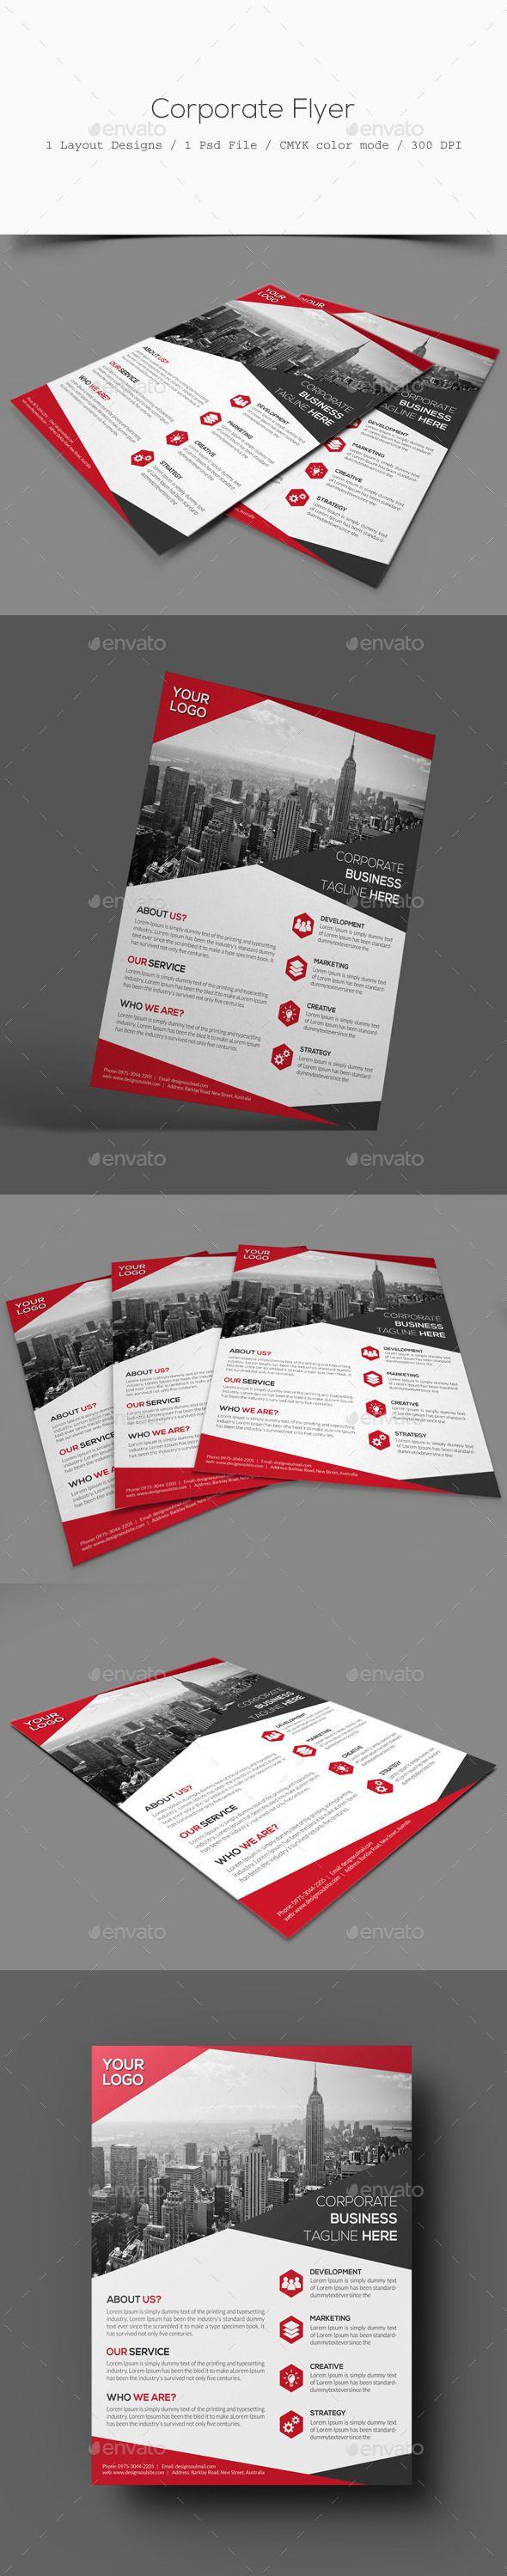 buy flyer templates - Kardas.klmphotography.co